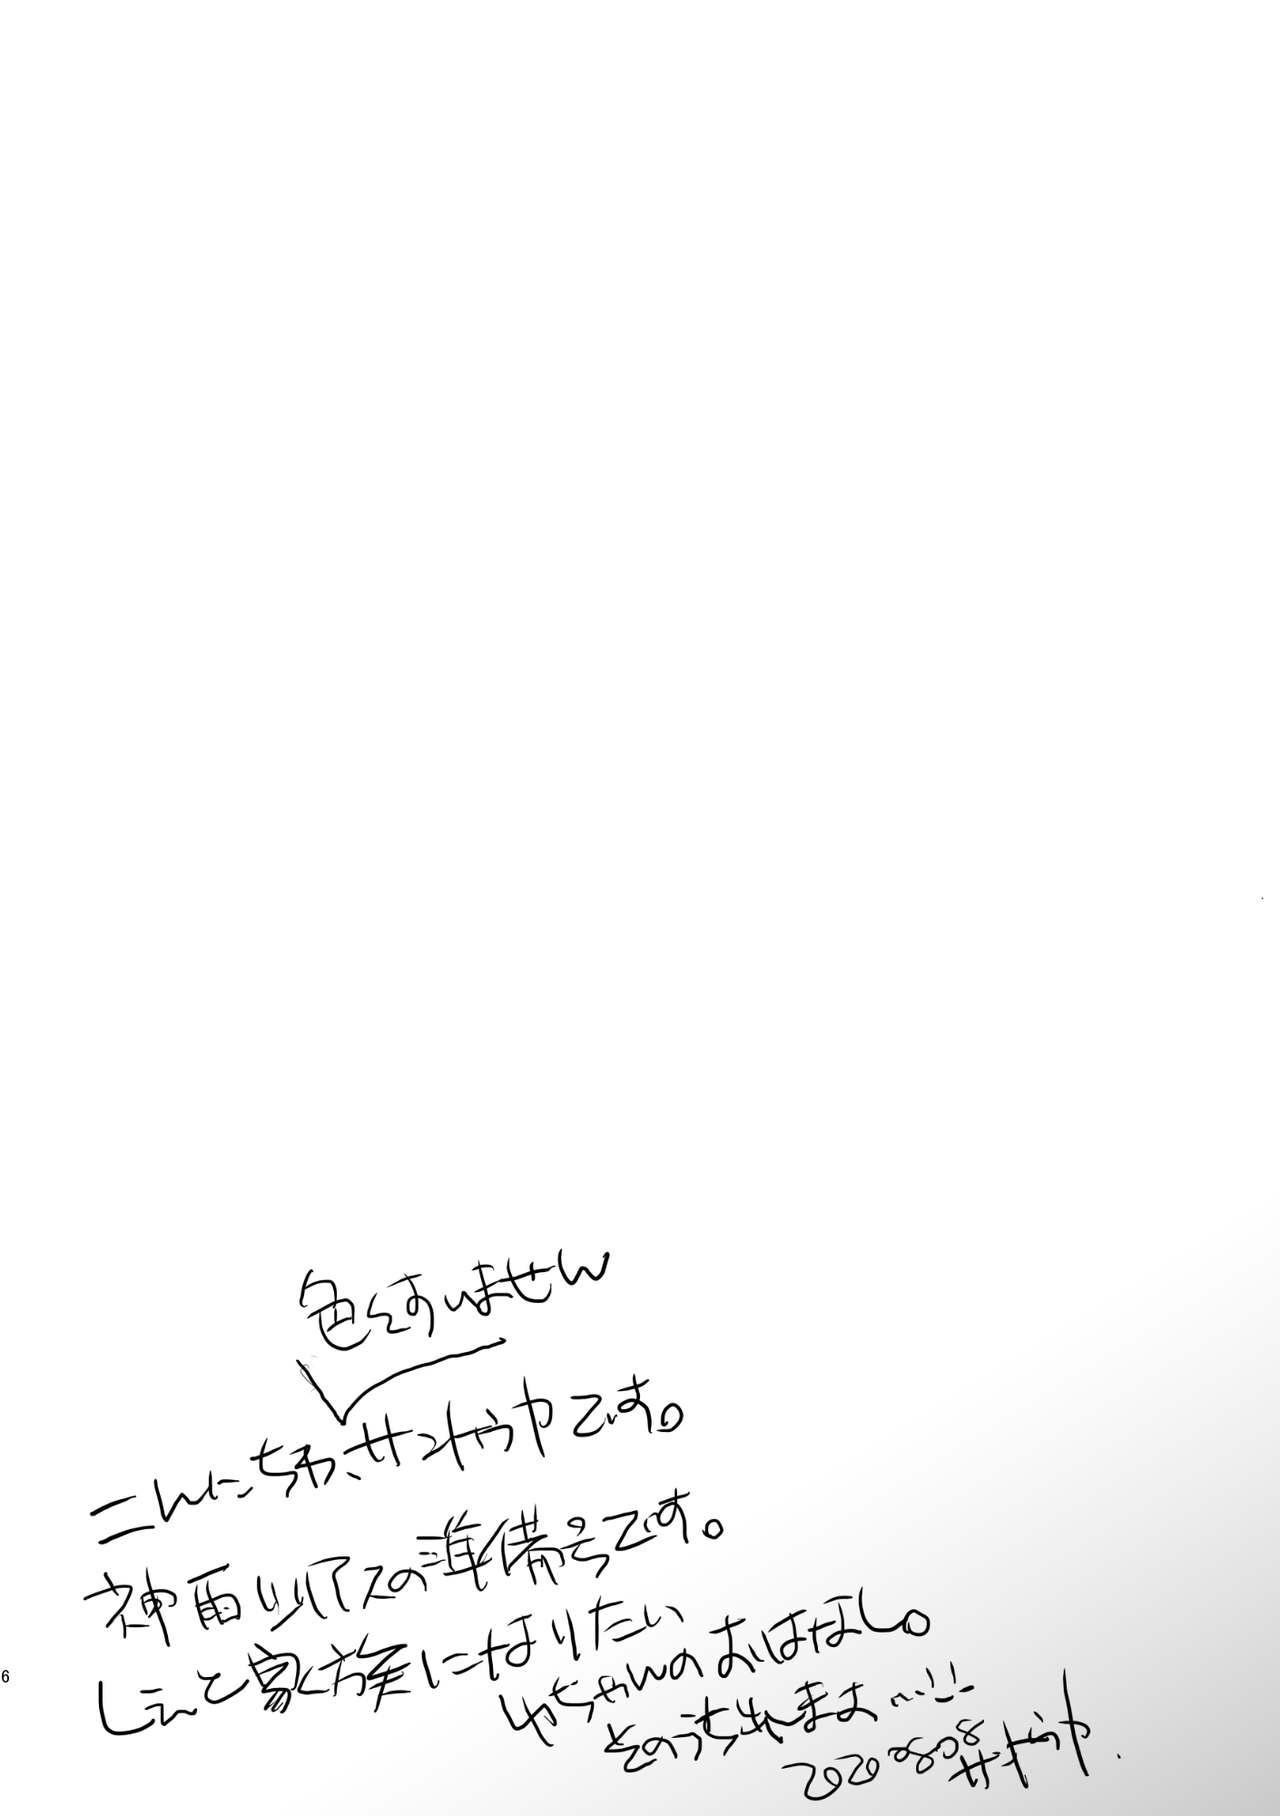 MELLOW Shunbi-gou 5